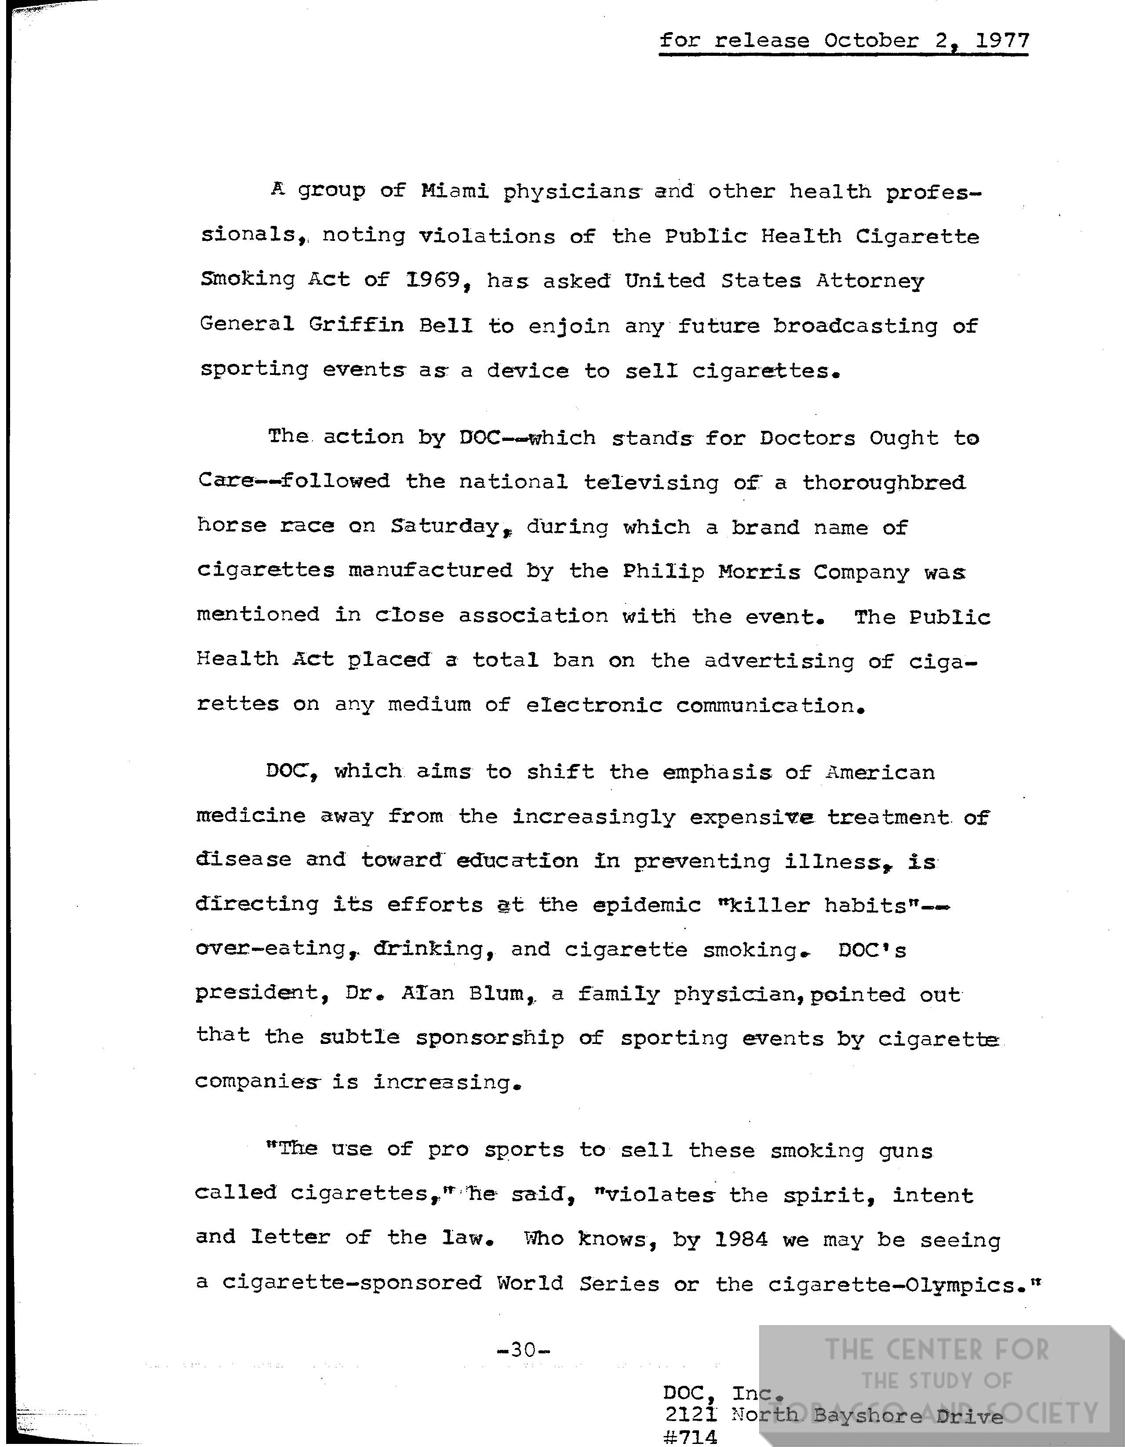 1977 10 02 DOC Press Release Marlboro Cup Televising